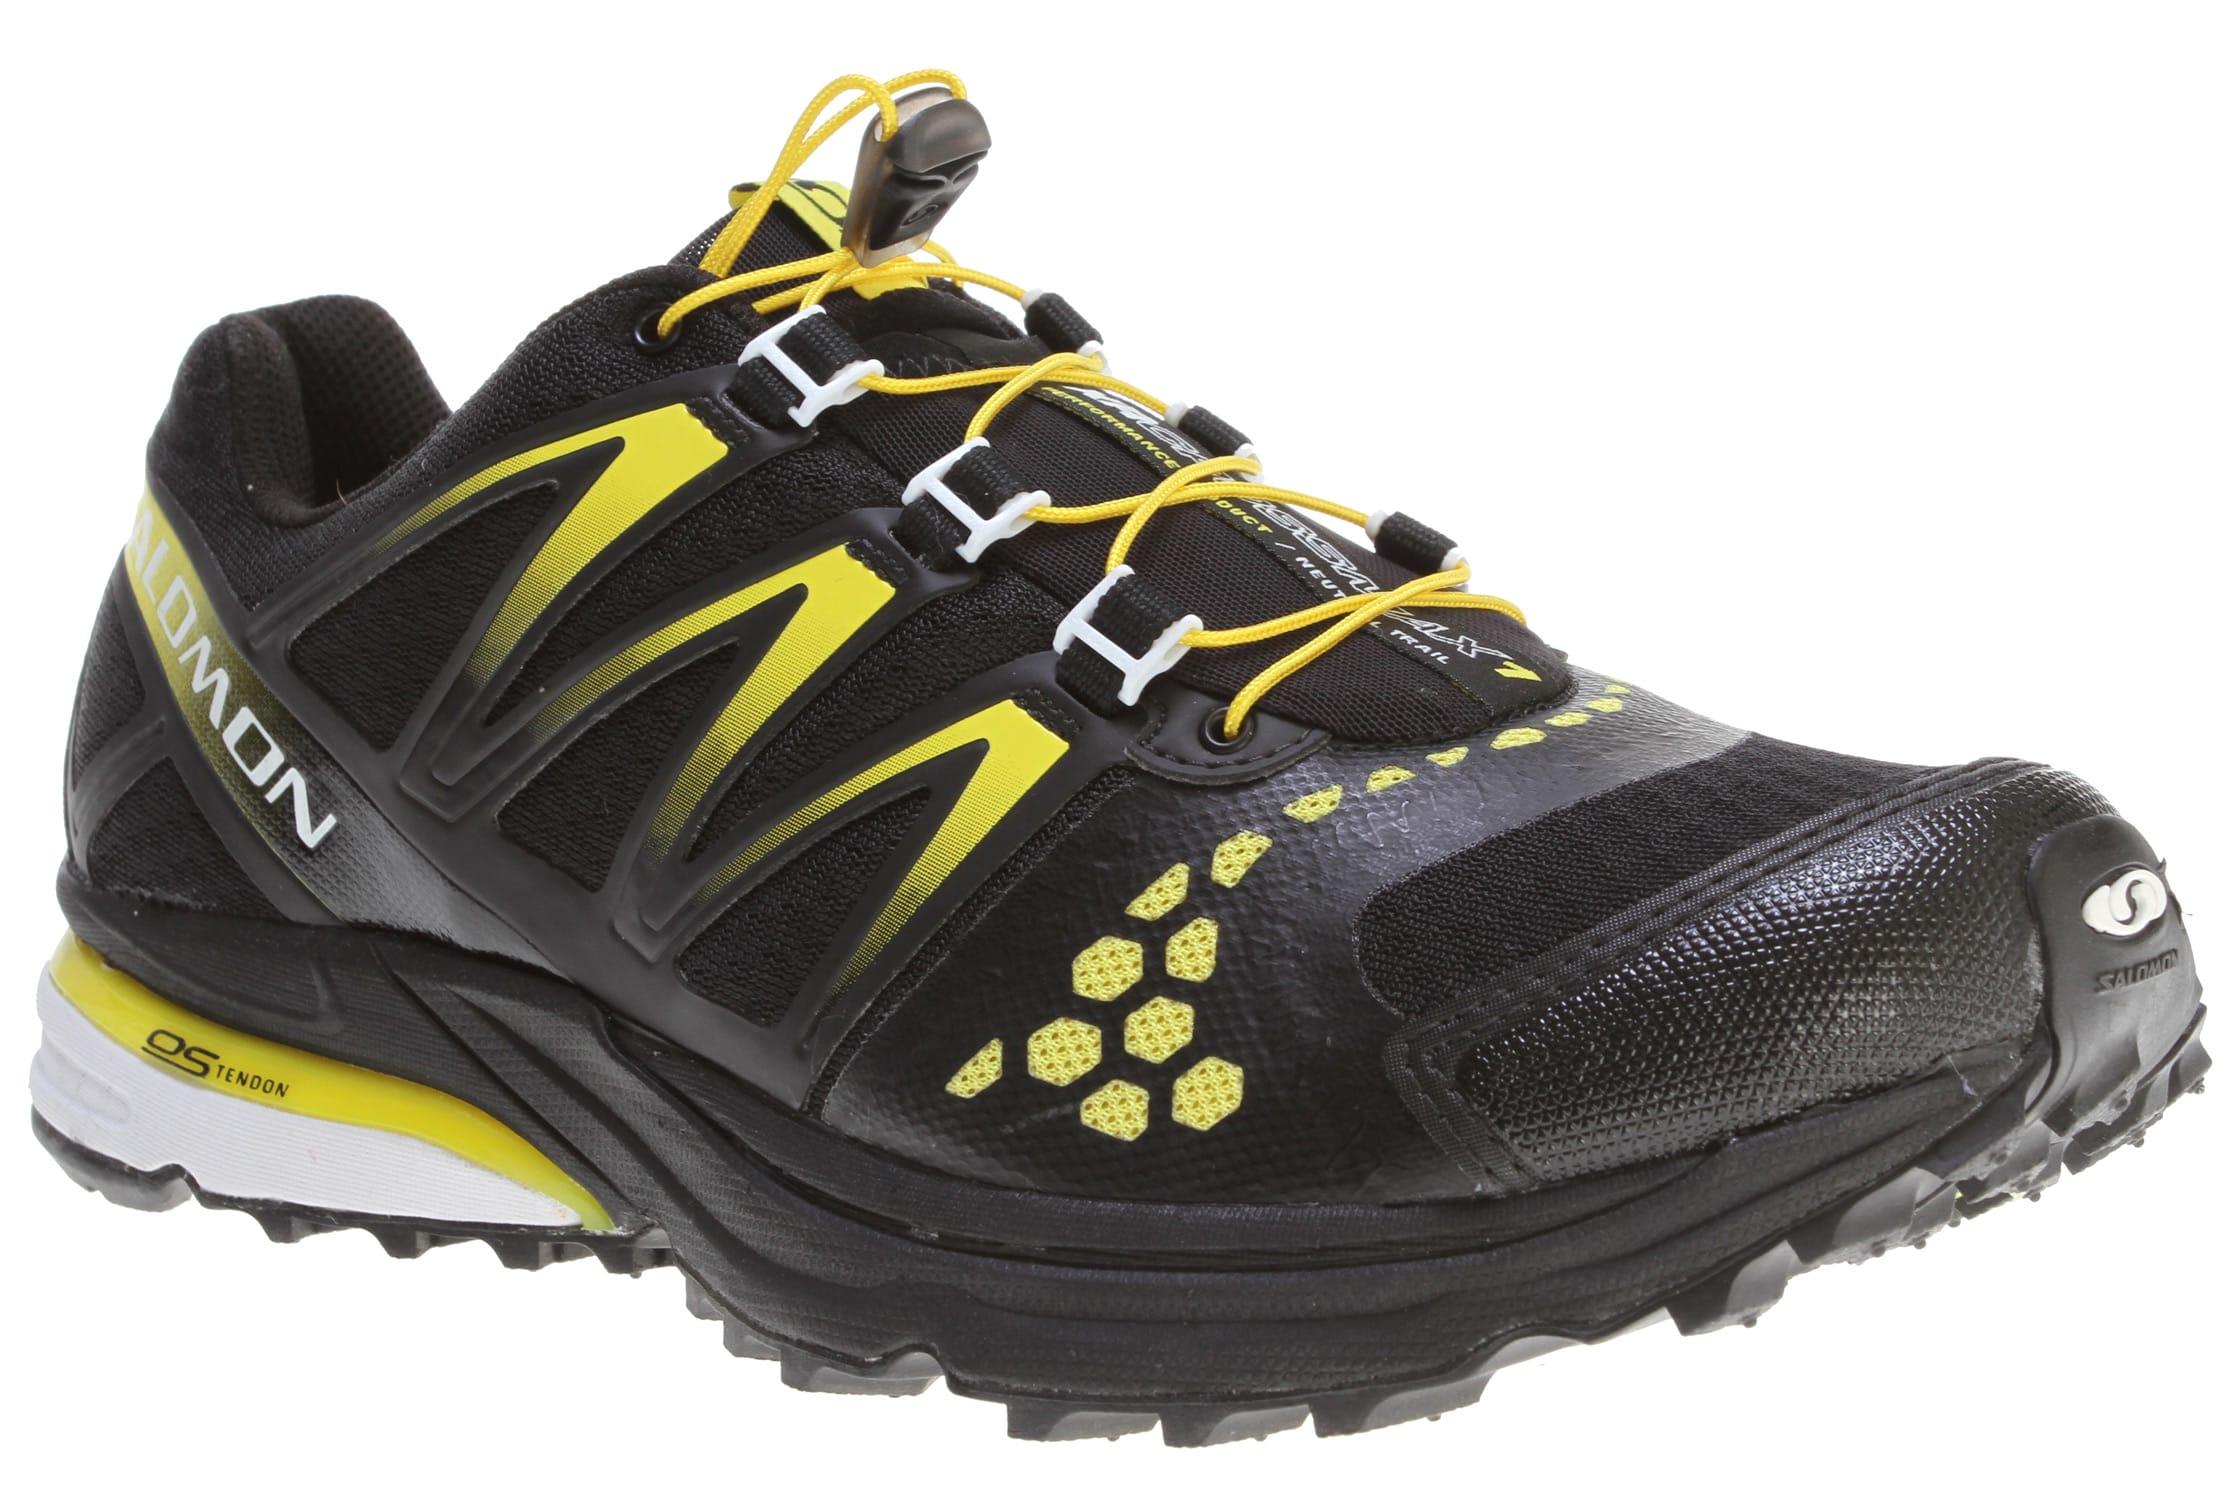 Salomon Trail Running Shoes Warranty